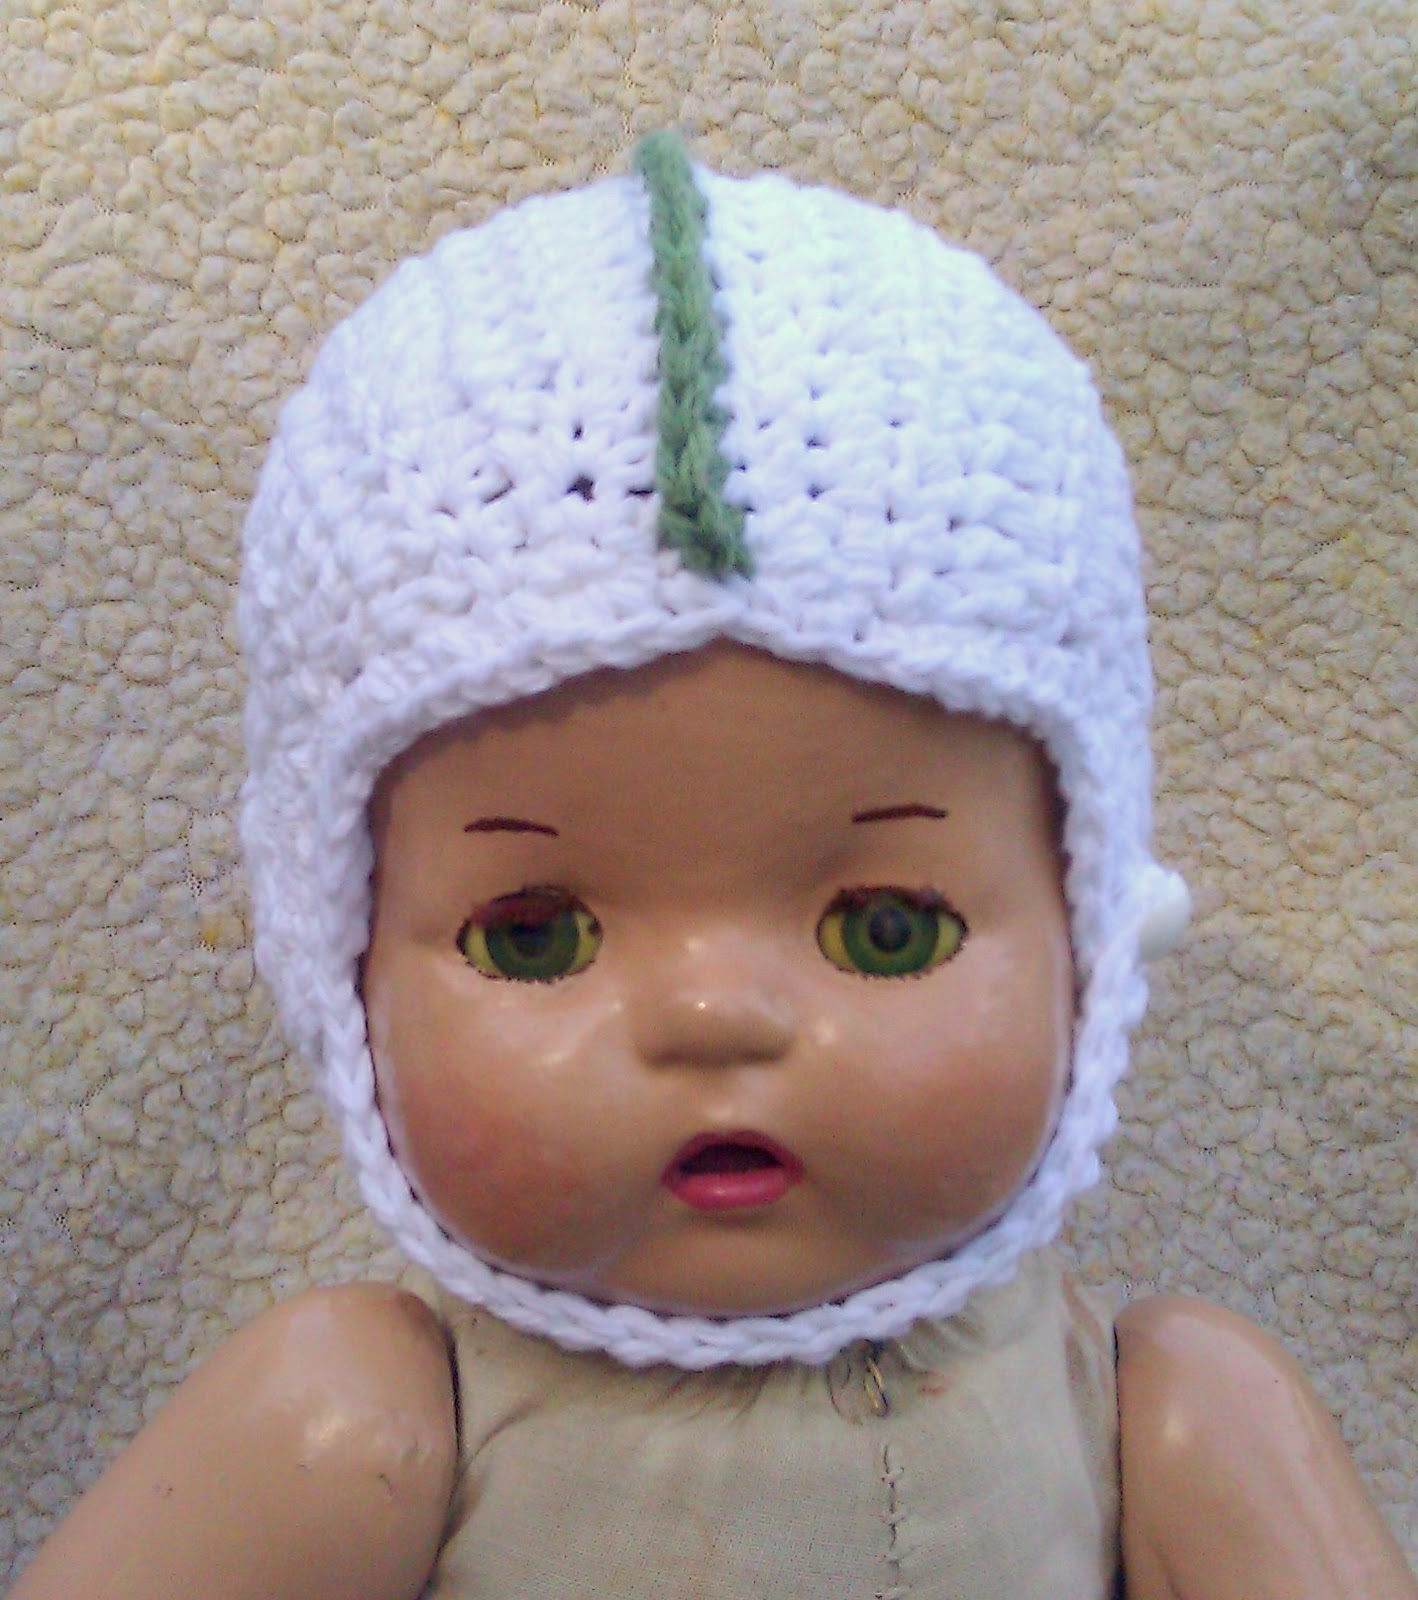 Baby Crochet Football Helmet Free Pattern